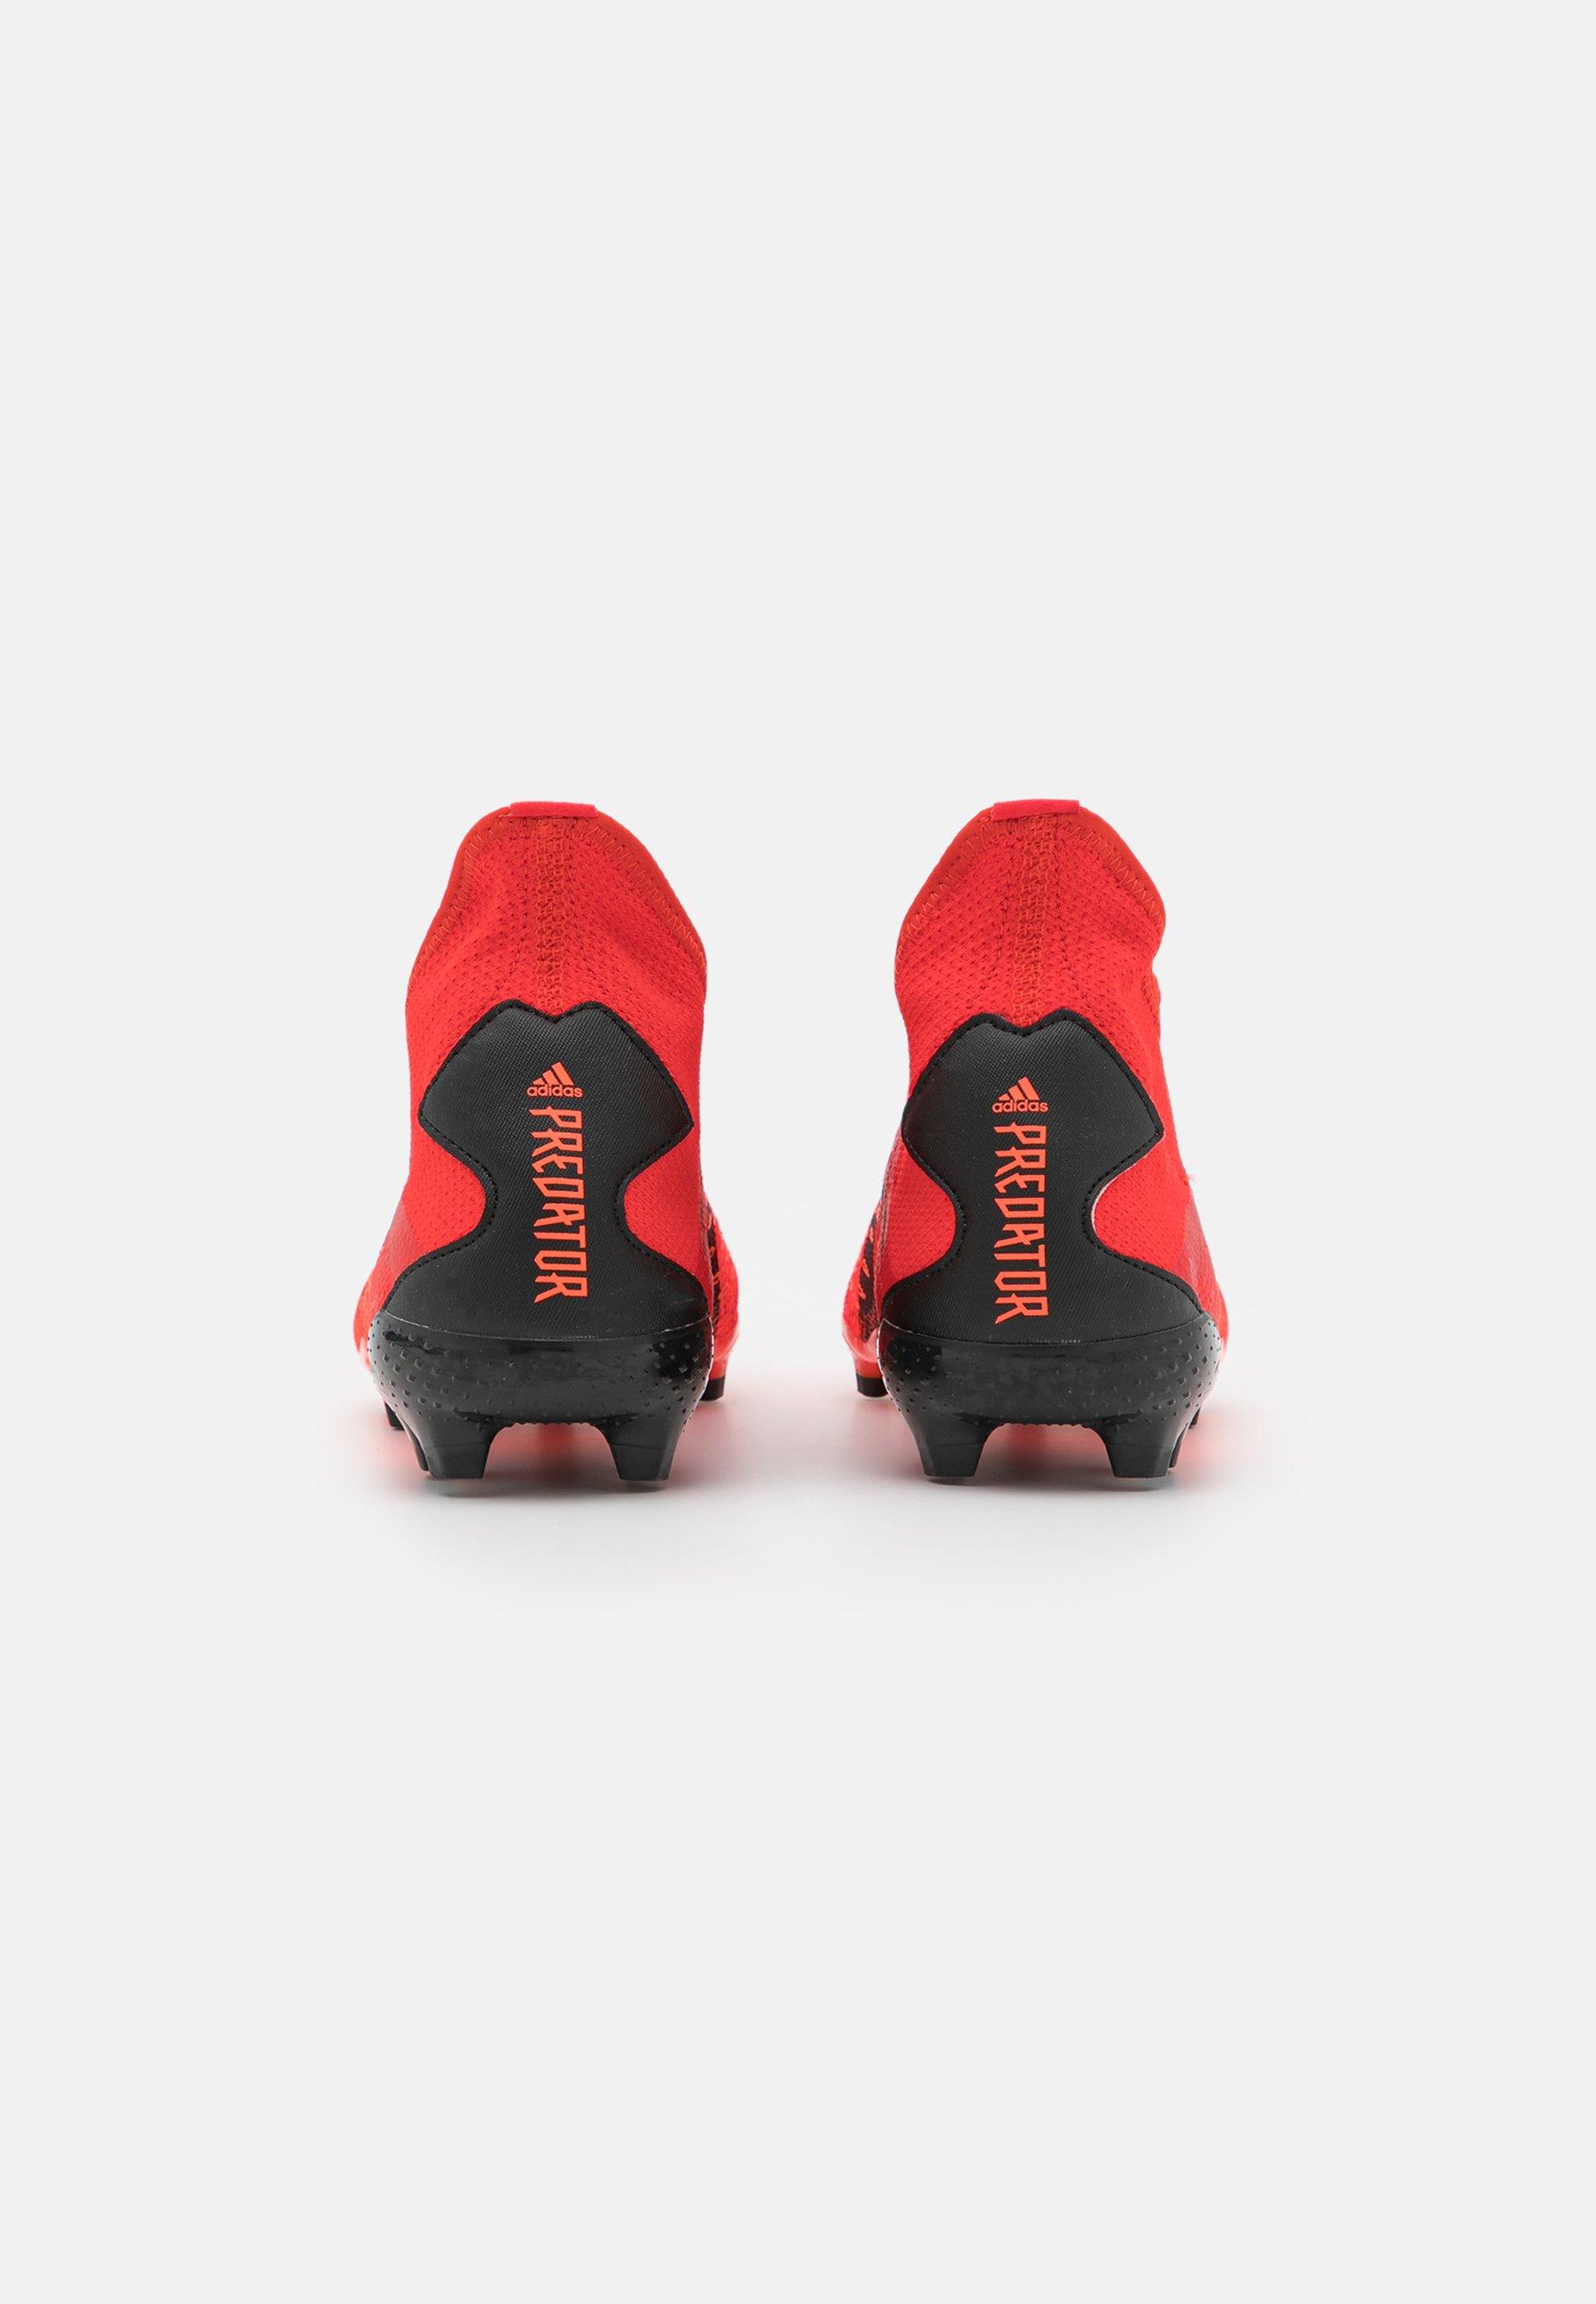 Homme PREDATOR FREAK .3 FG - Chaussures de foot à crampons